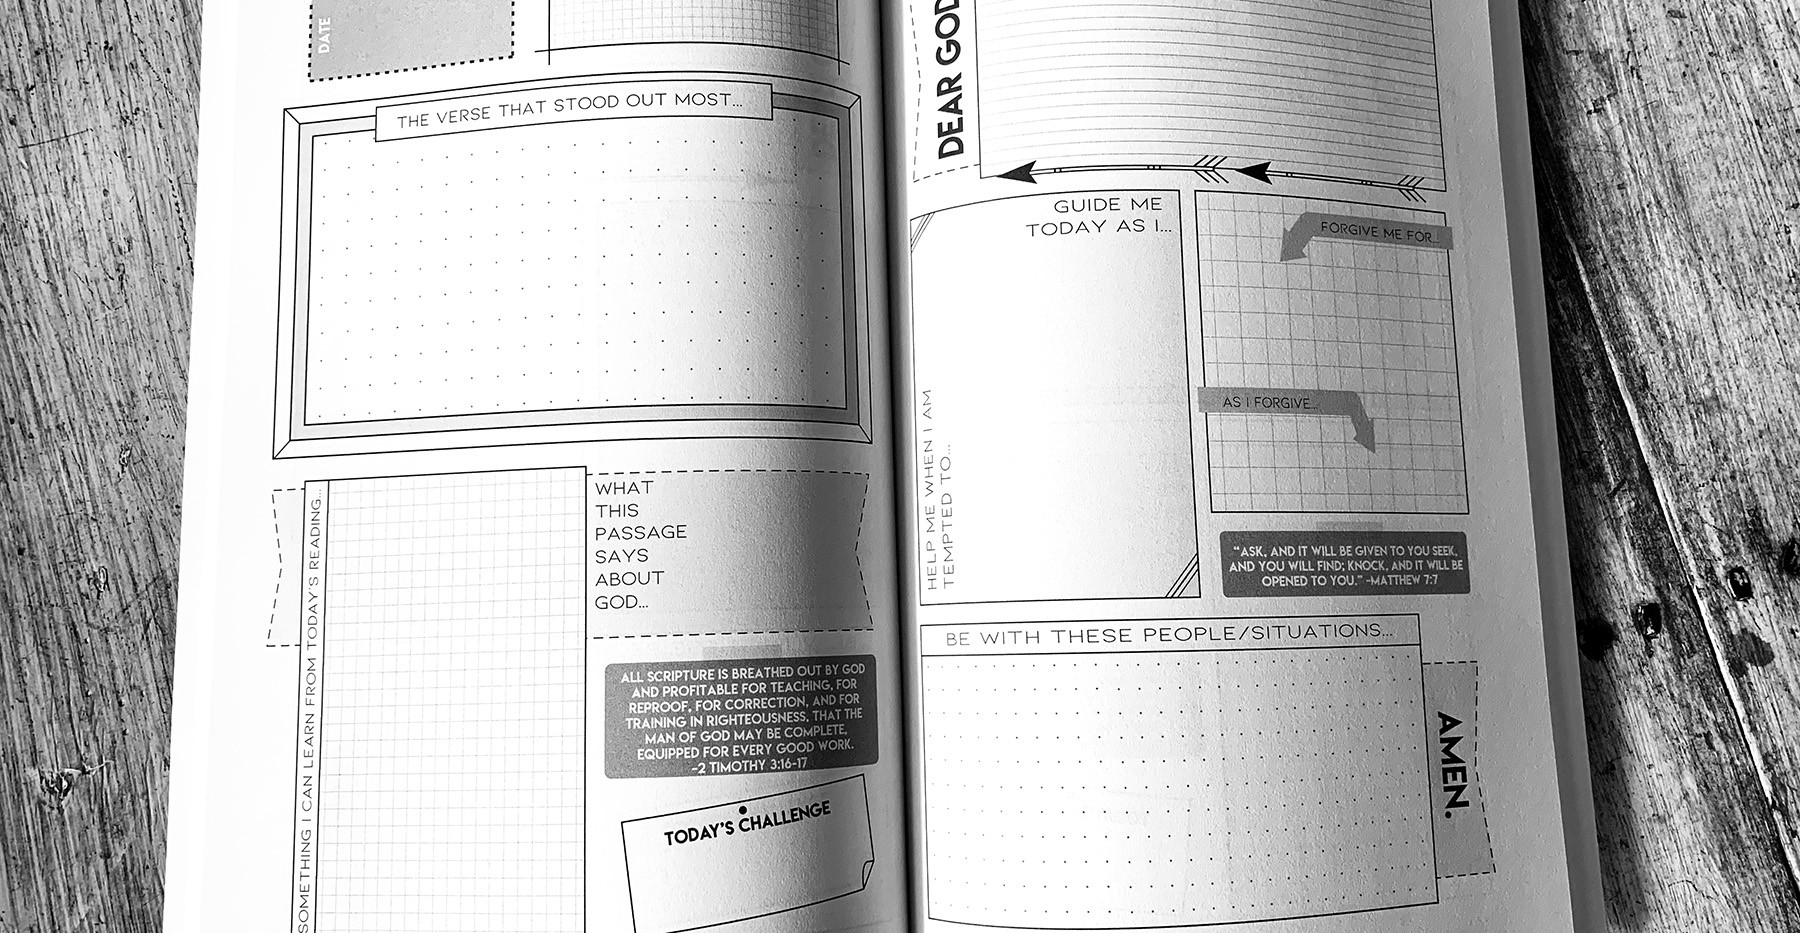 Image Inside Journal